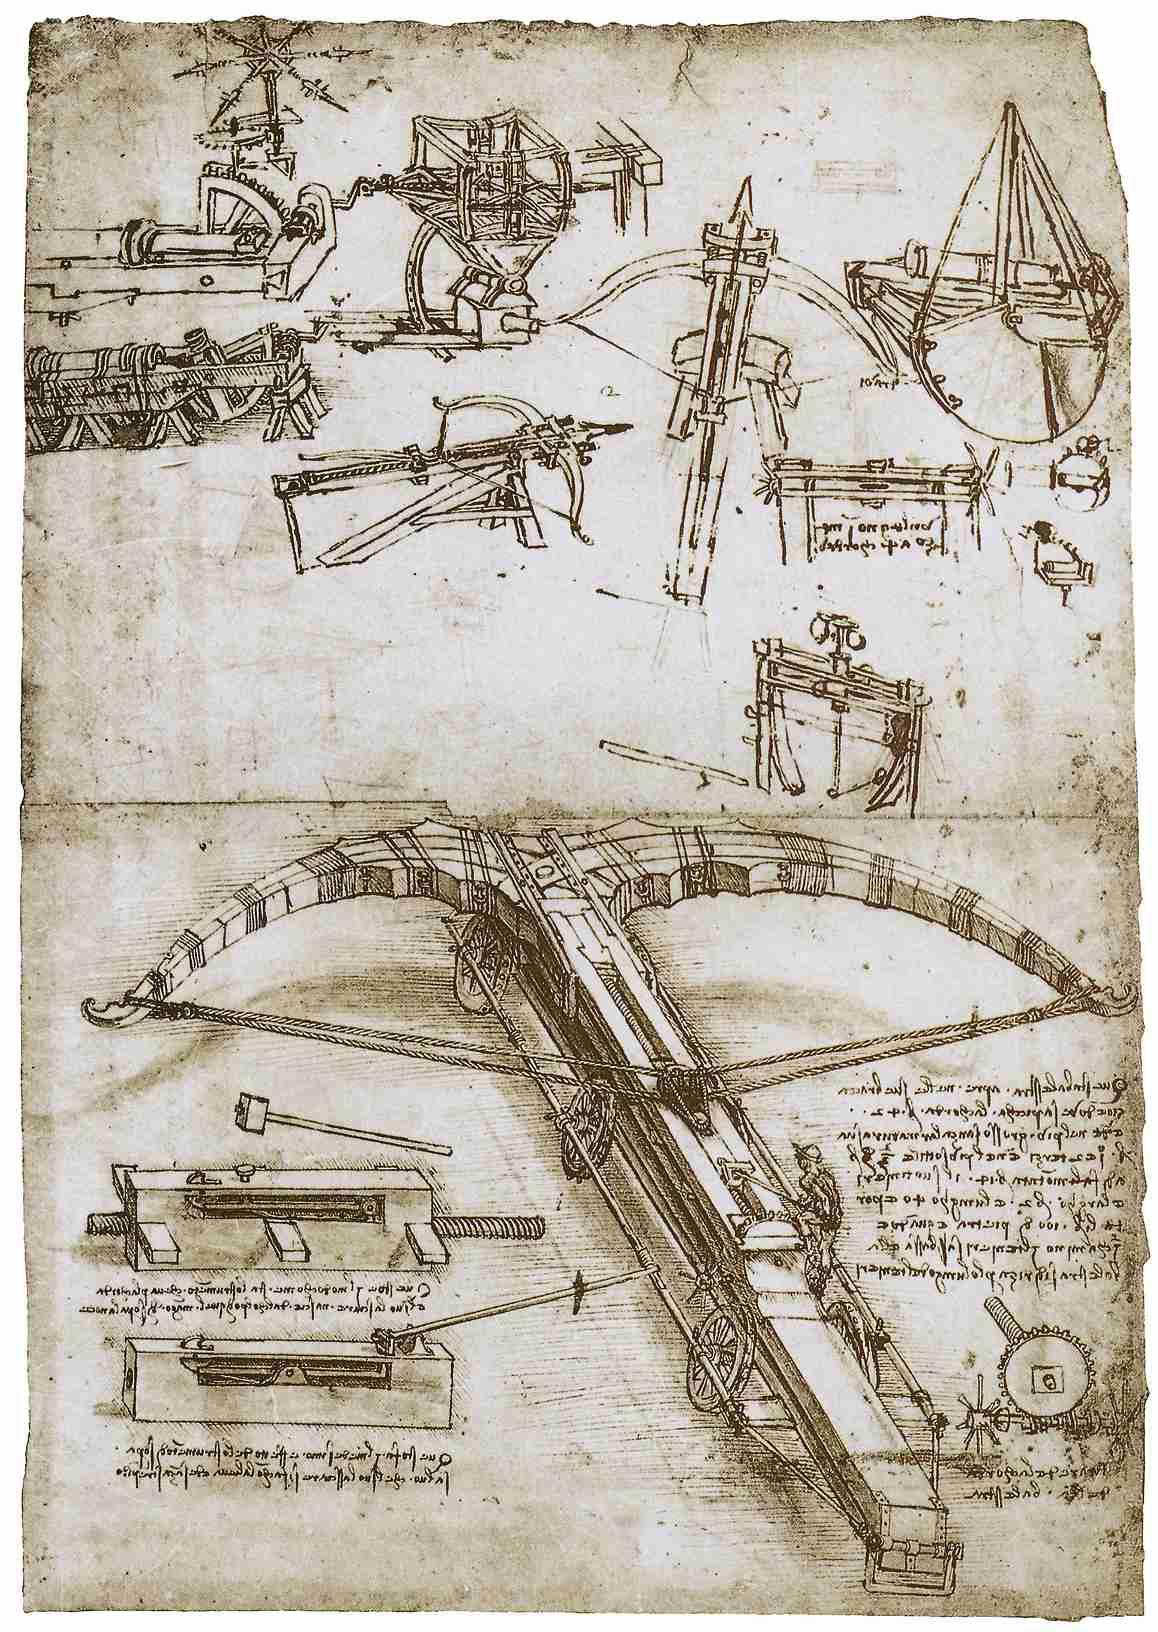 Гигантский арбалет. Рисунок Леонардо да Винчи. Источник http://tradiciadrevnih.ru/